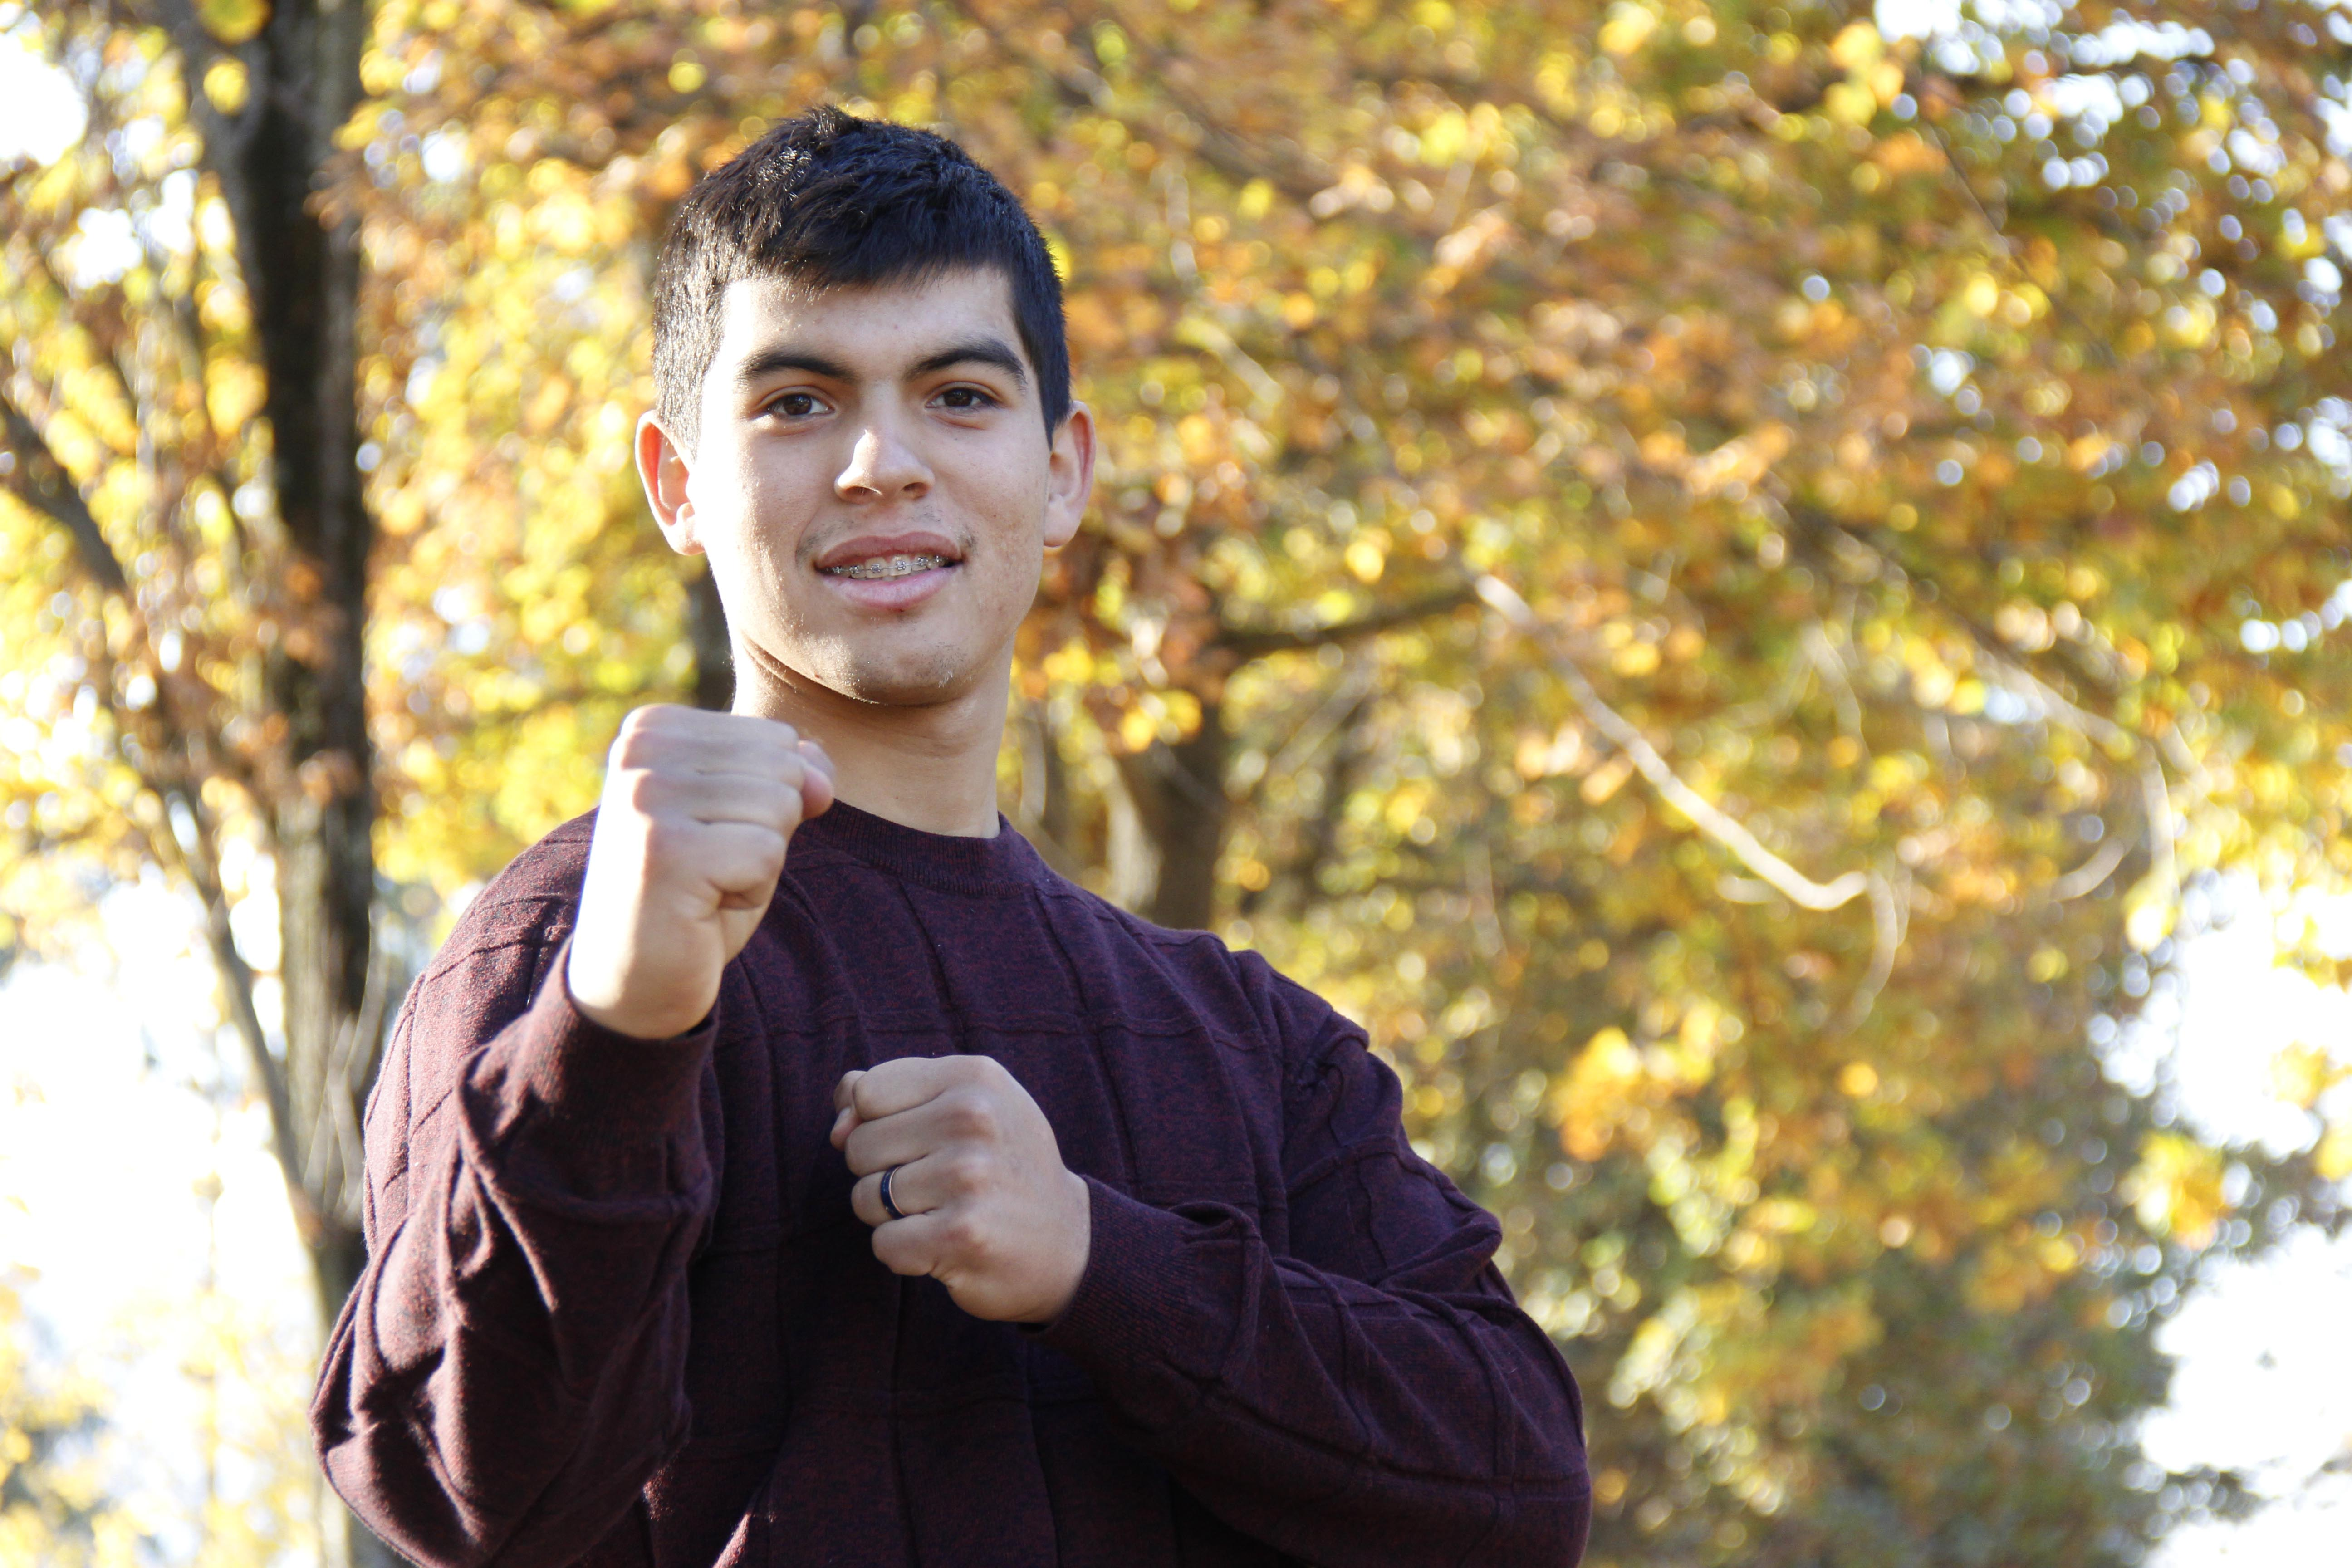 Joven maulino viaja a Campeonato Mundial de Taekwondo en Corea del Sur